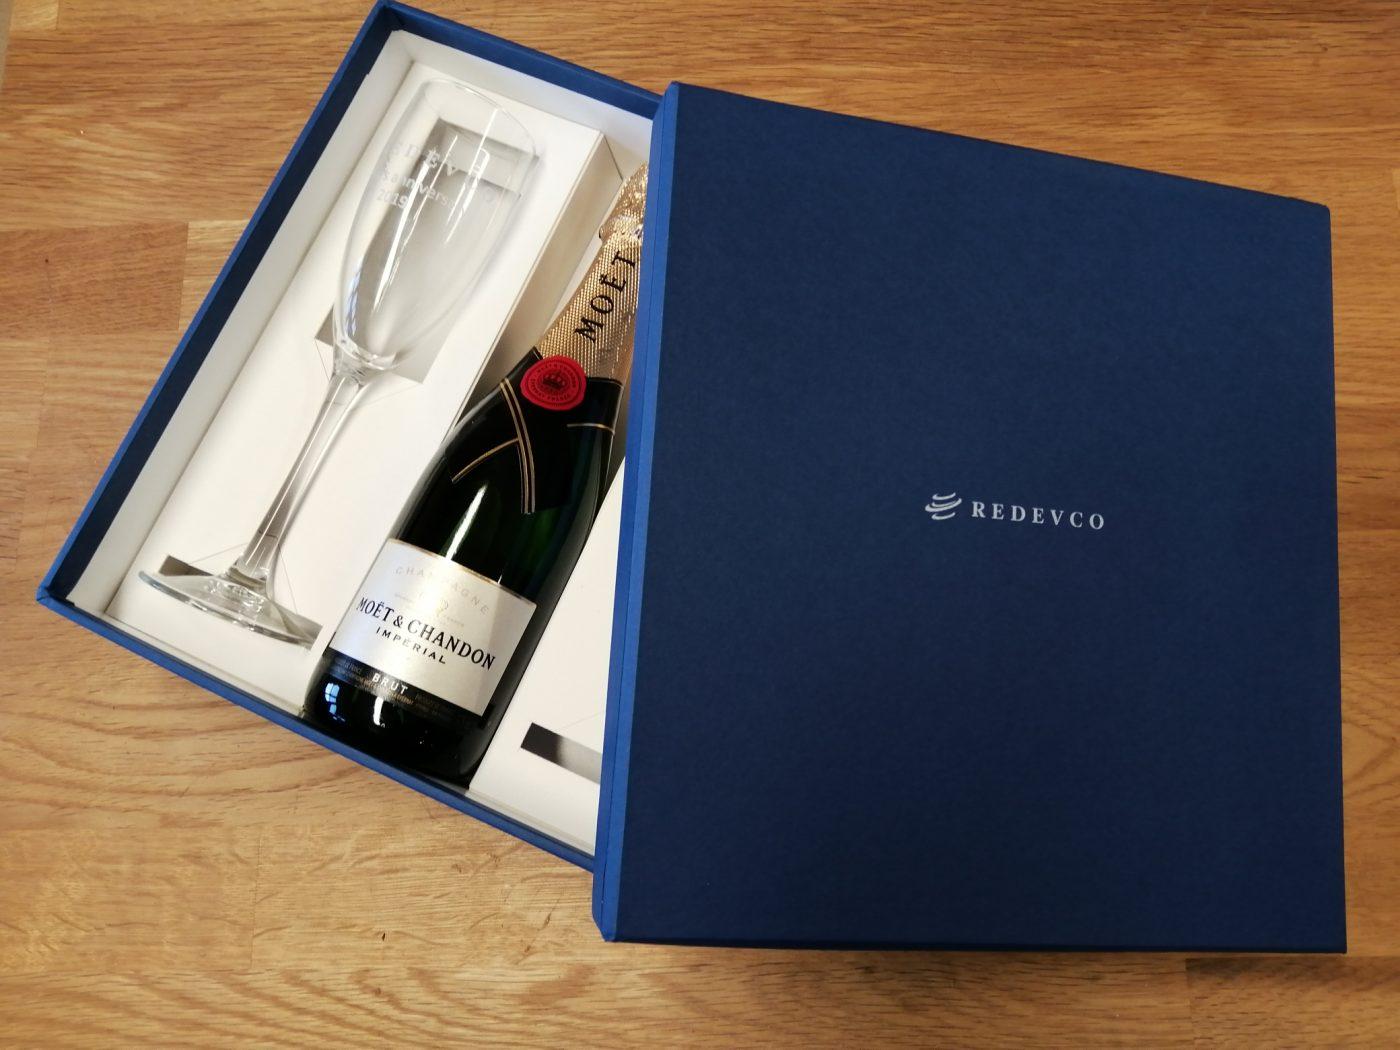 Champagne and Glasses Box